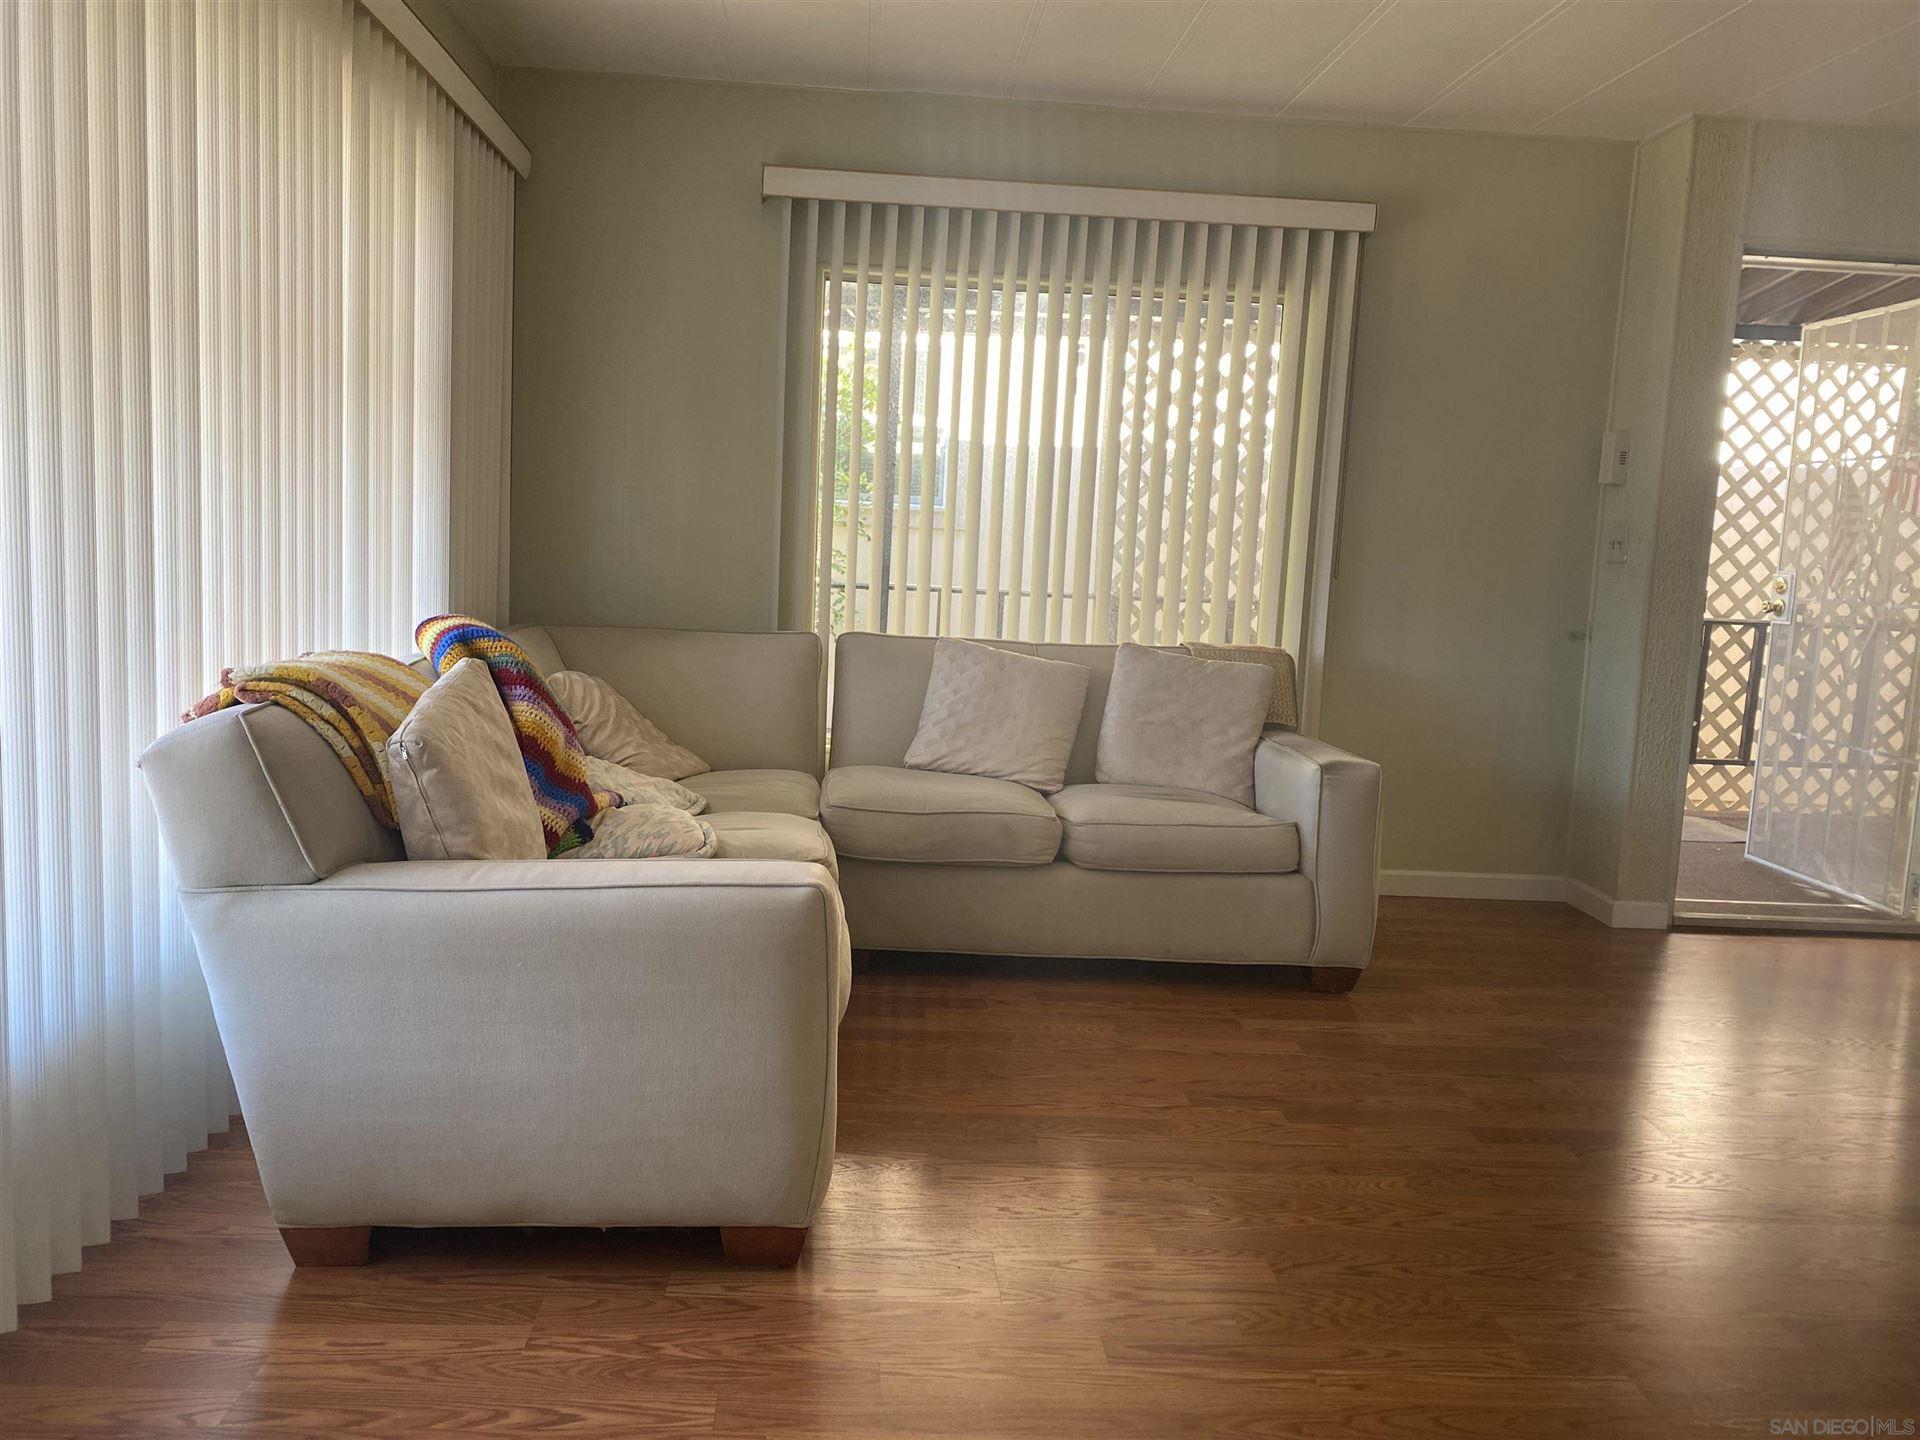 Photo of 9255 N Magnolia #342, Santee, CA 92071 (MLS # 210028482)